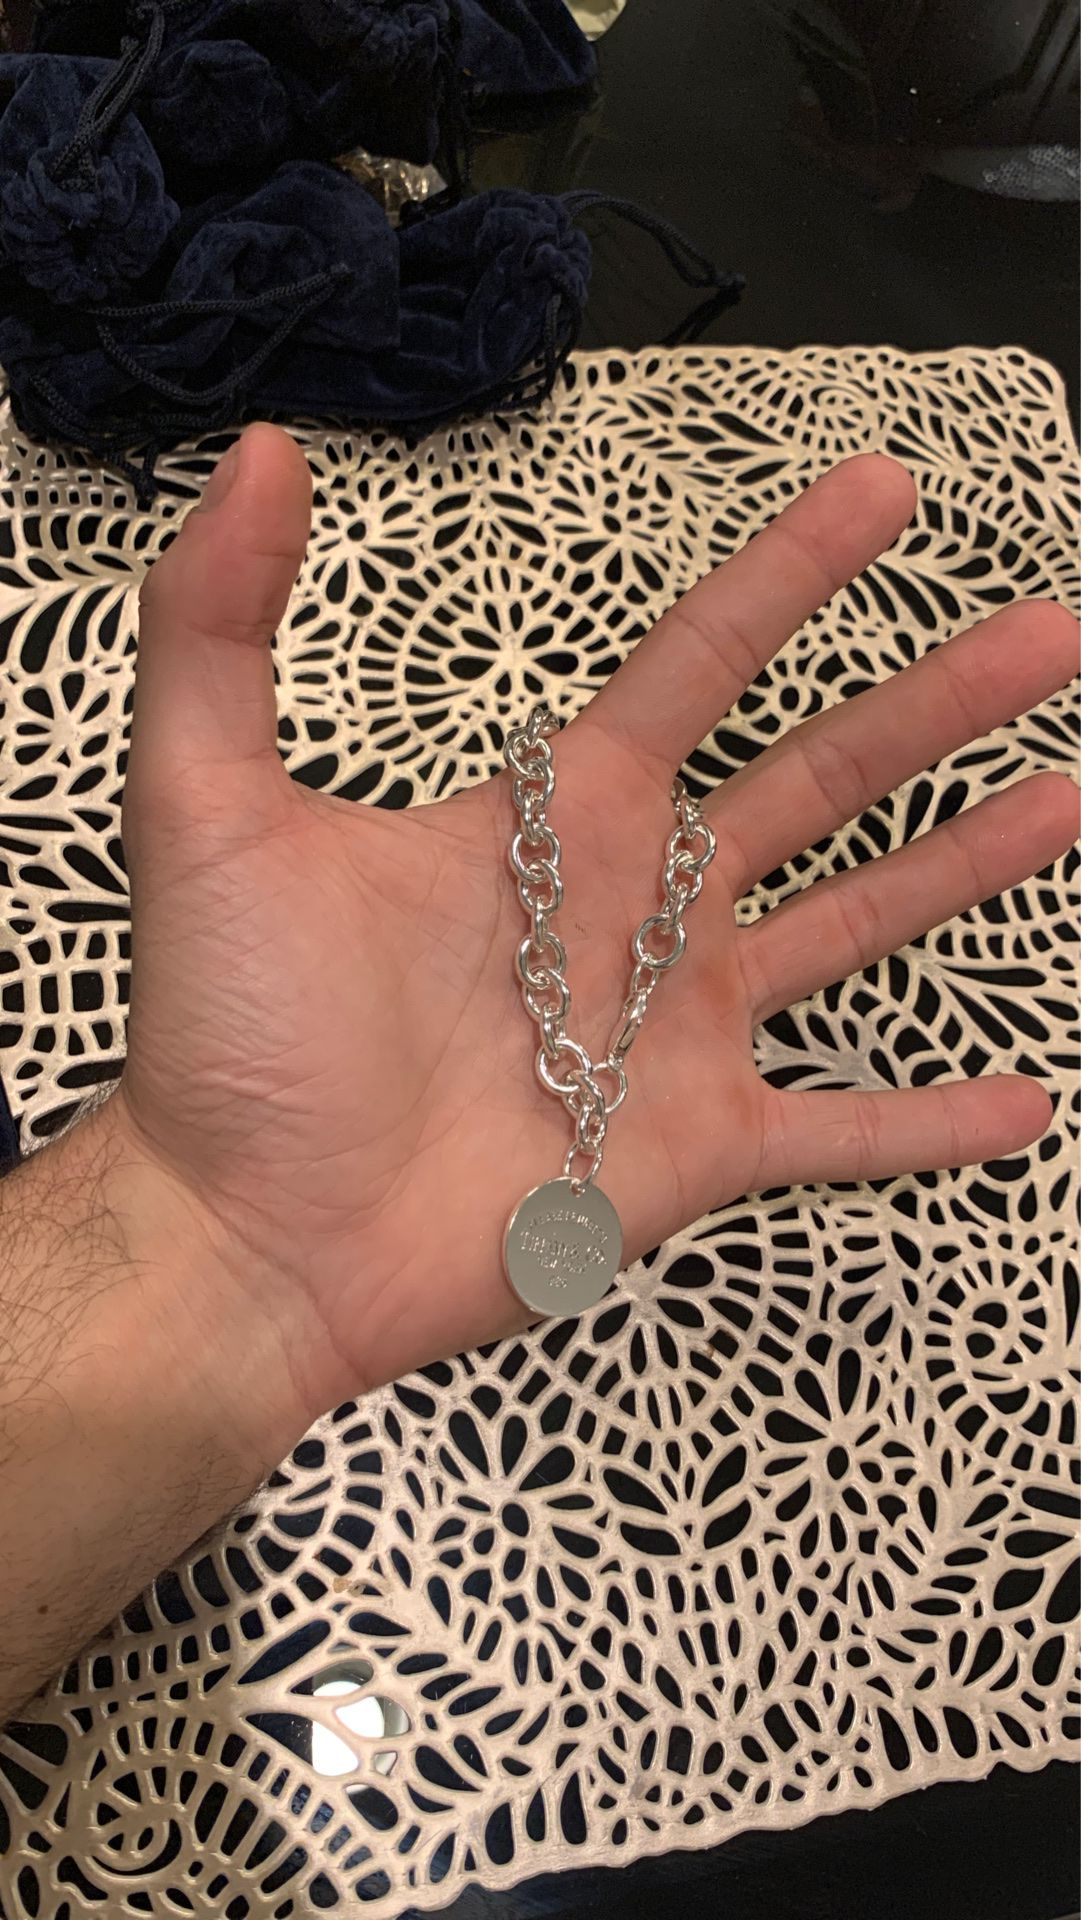 Tiffany & co silver 925 bracelet